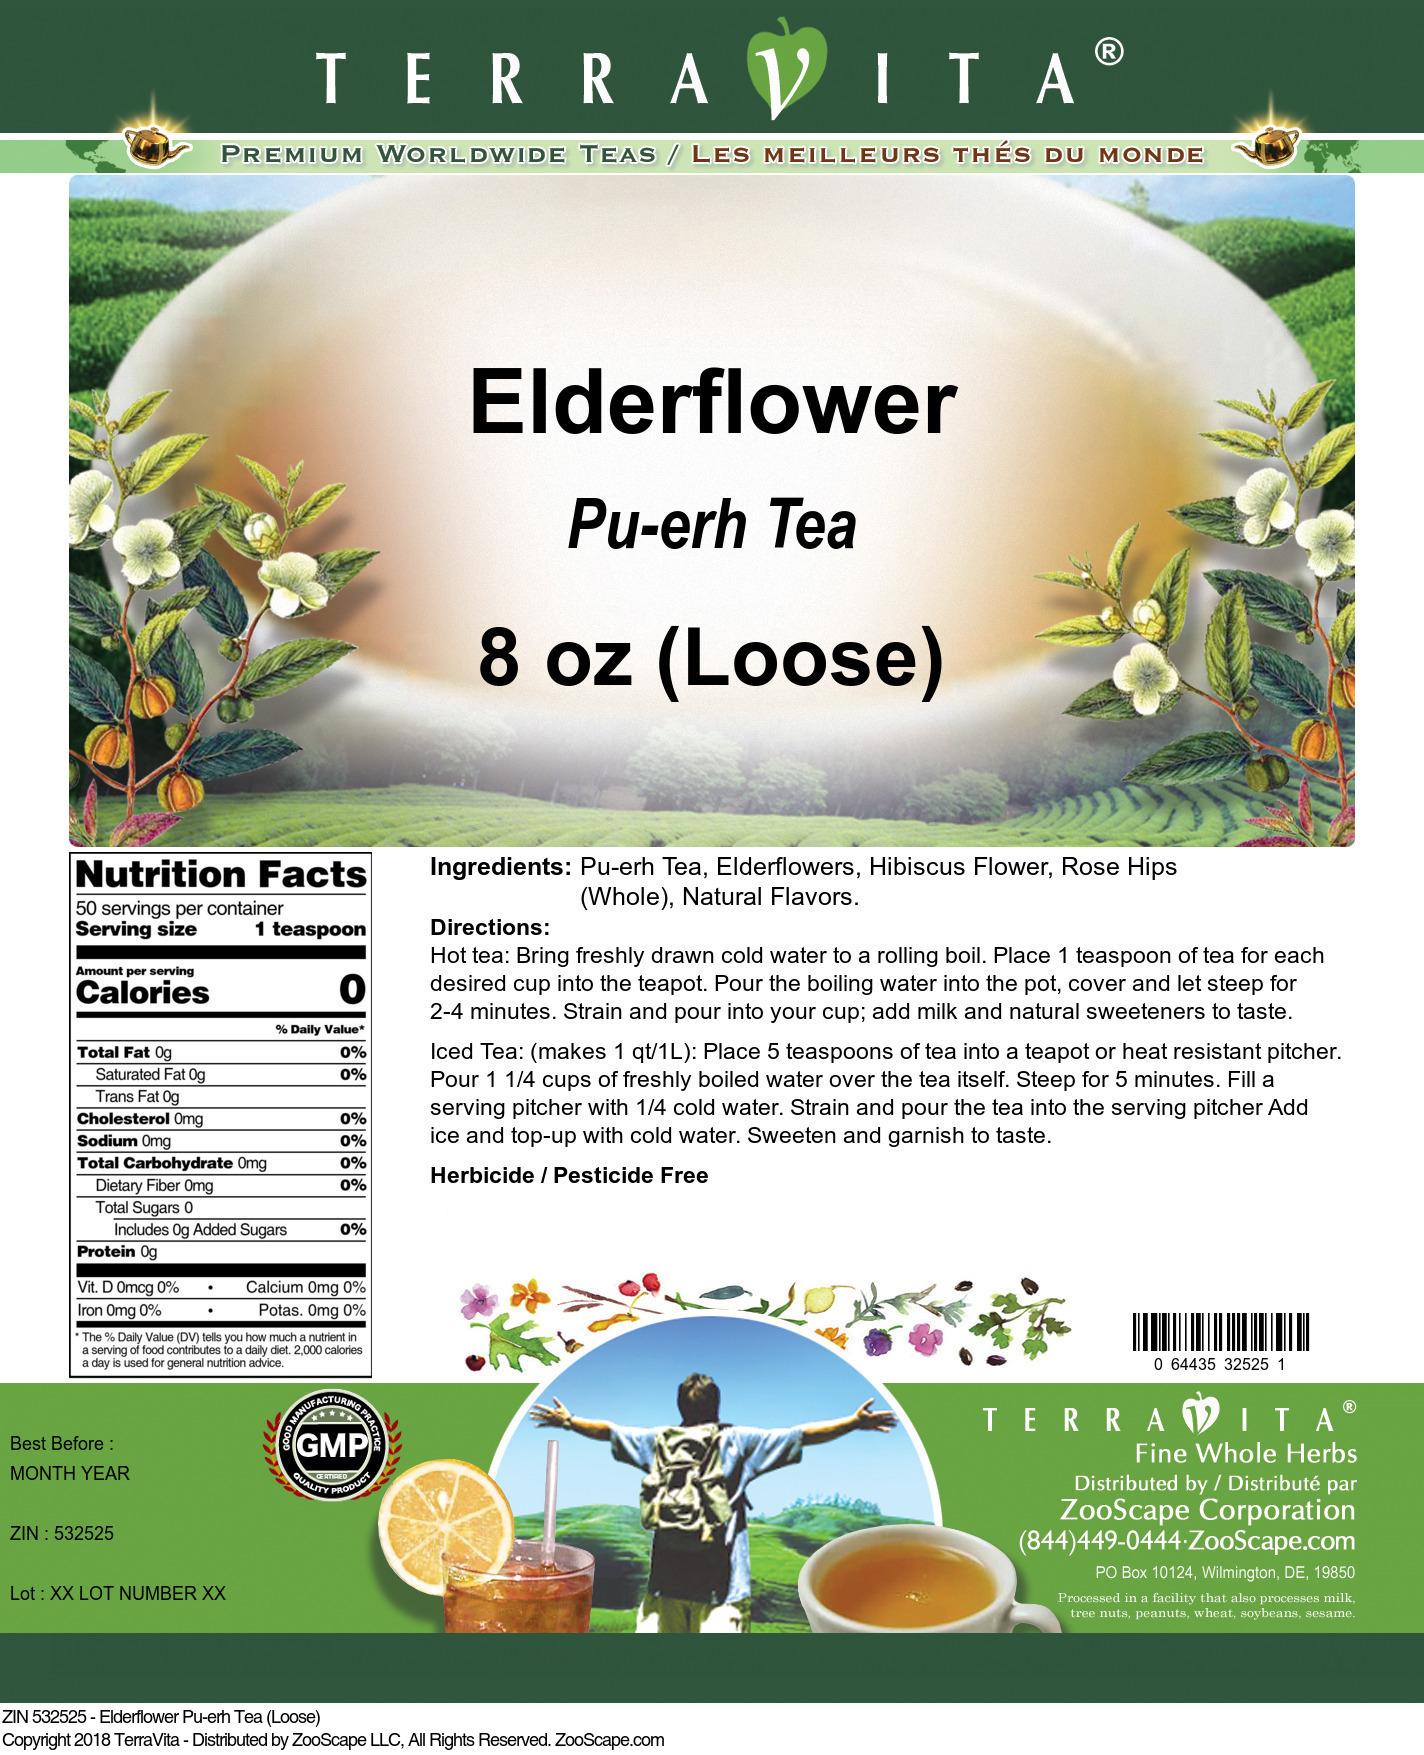 Elderflower Pu-erh Tea (Loose)